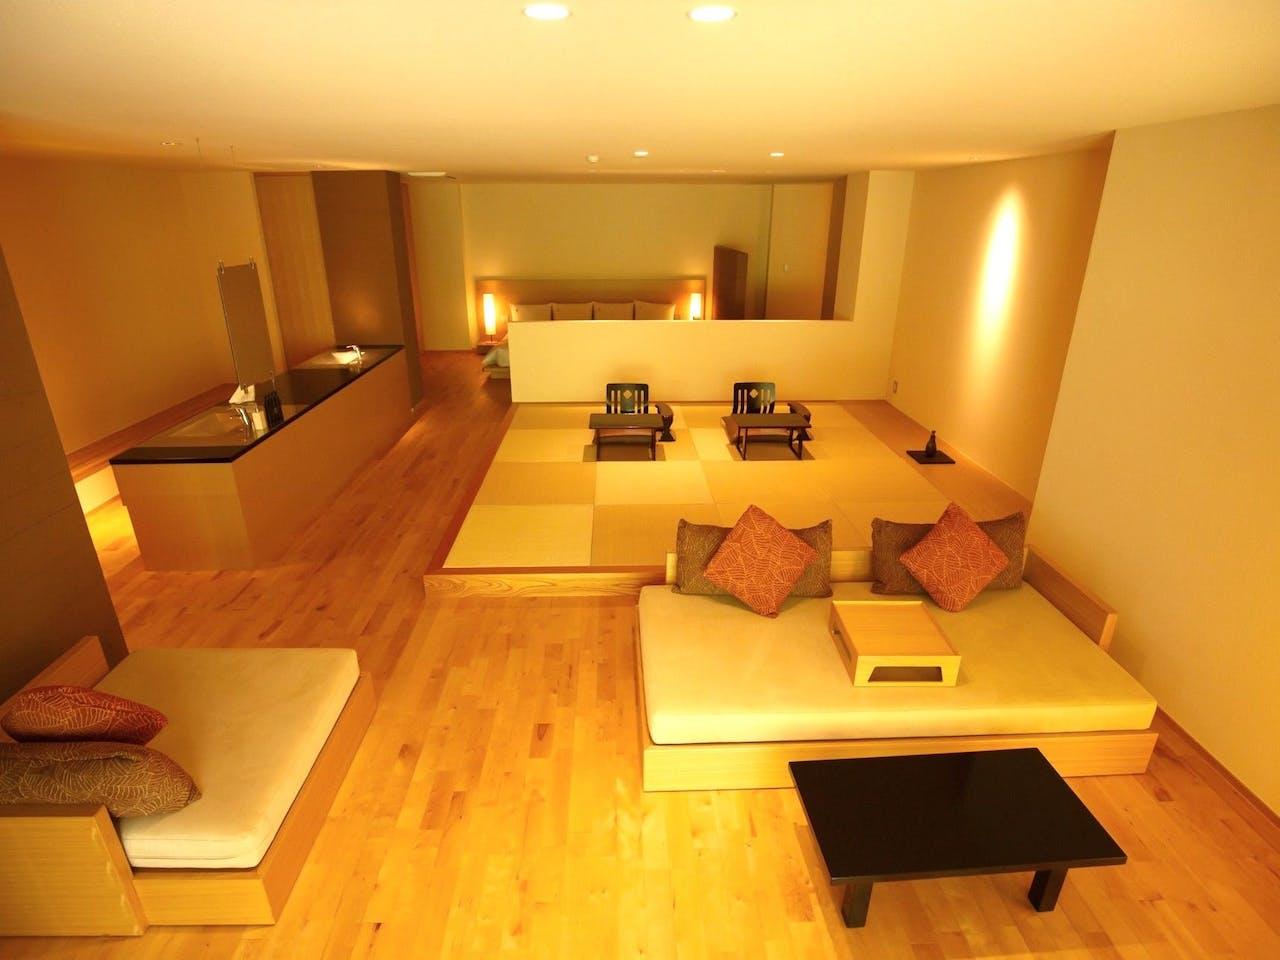 露天風呂付き客室の一例(空401号室)